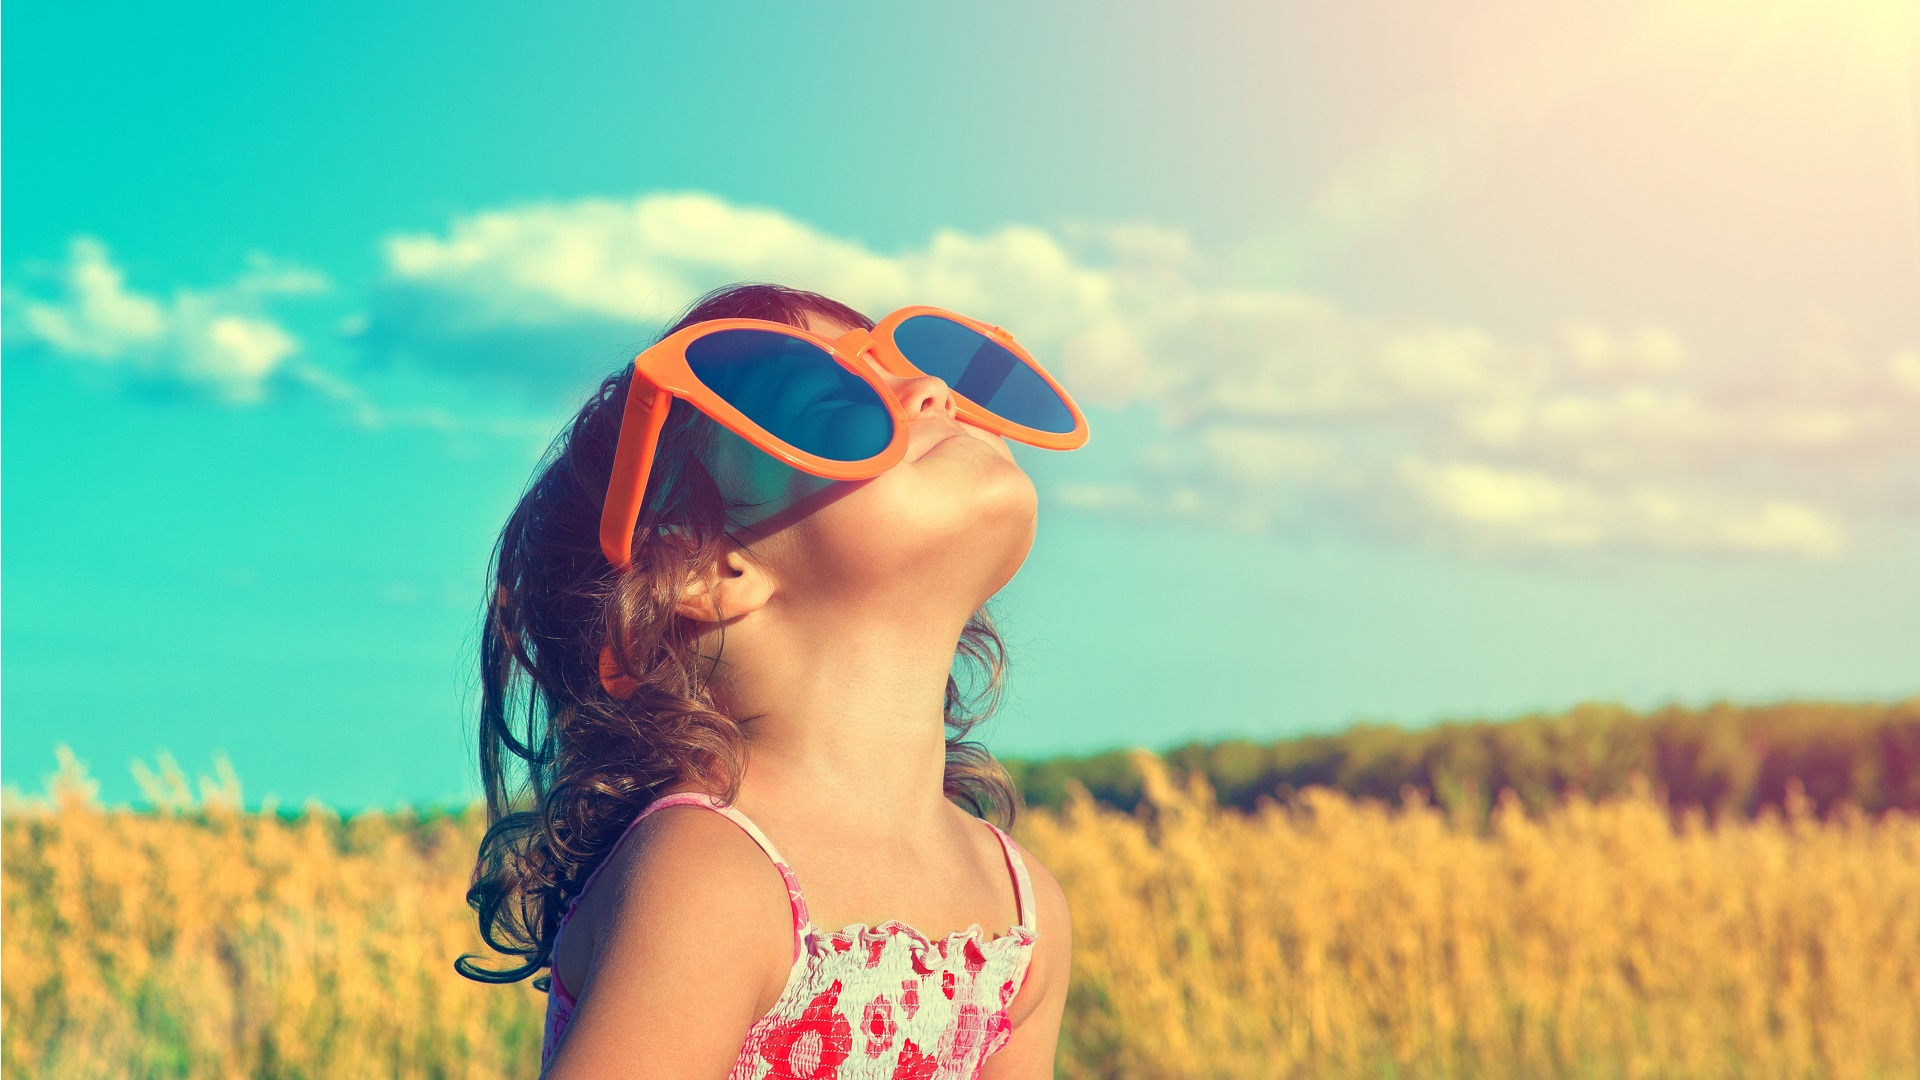 Meisje met grote zonnebril